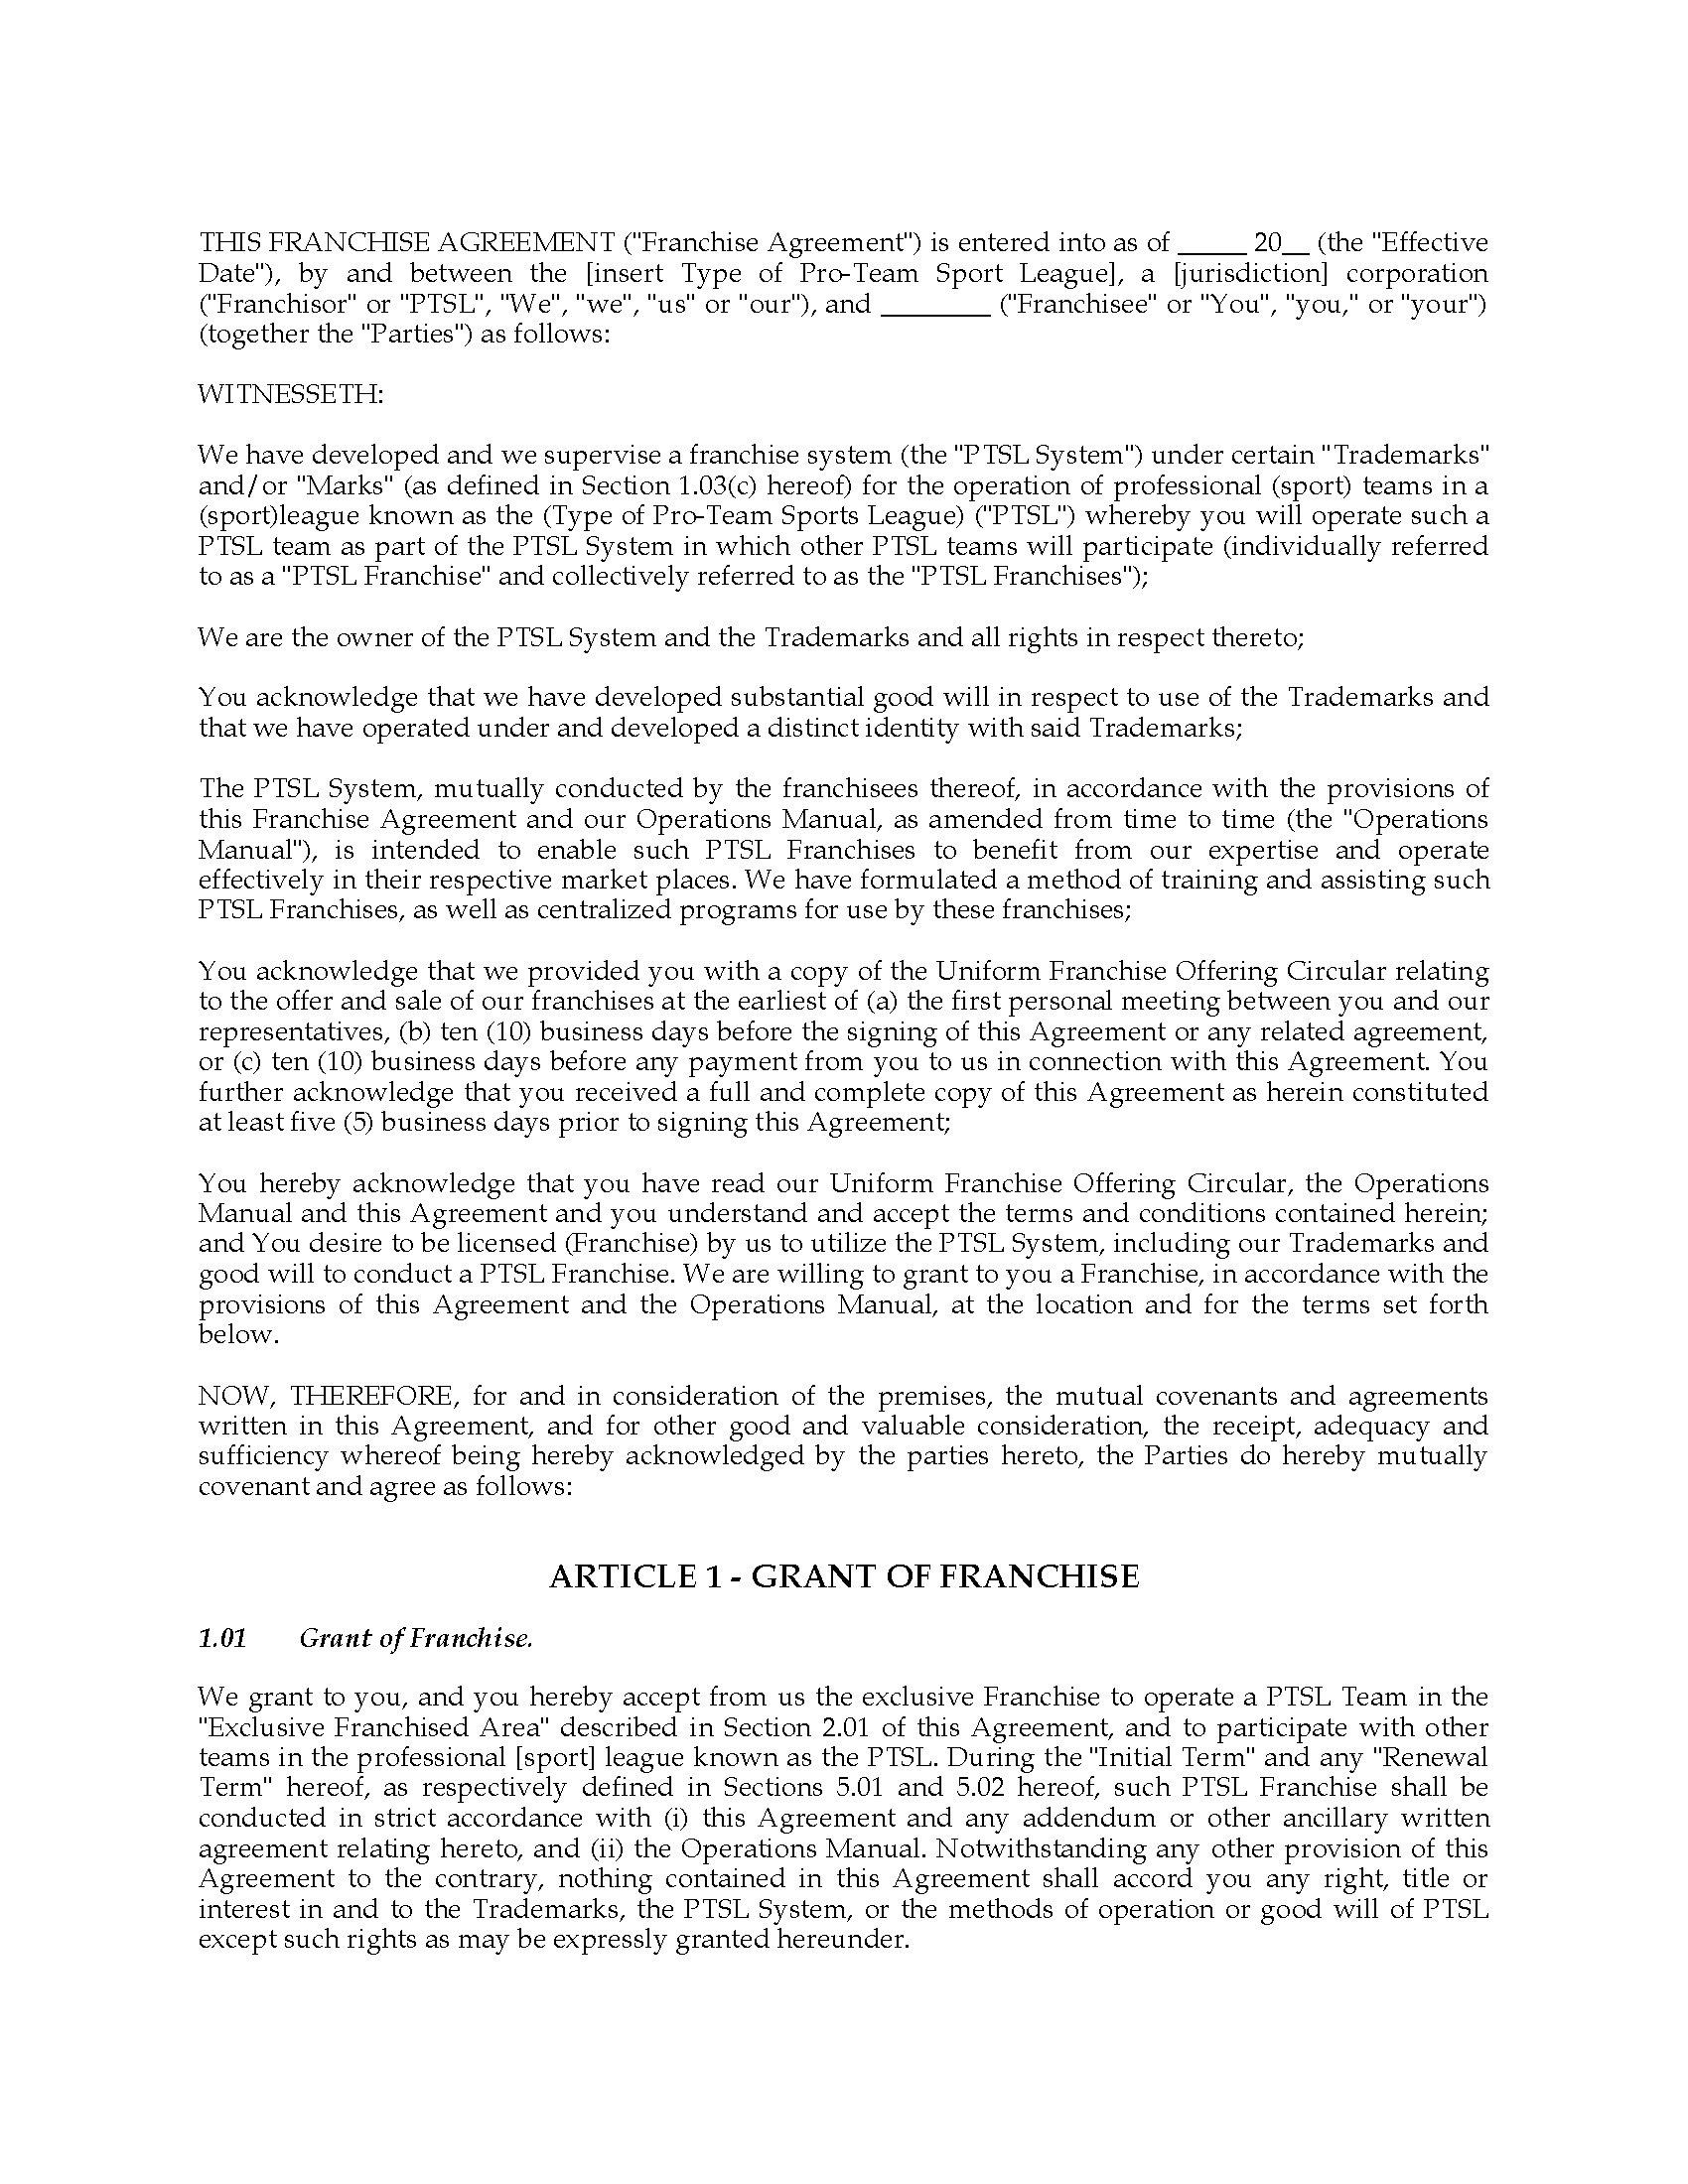 Awesome Training Franchise Agreement Sample